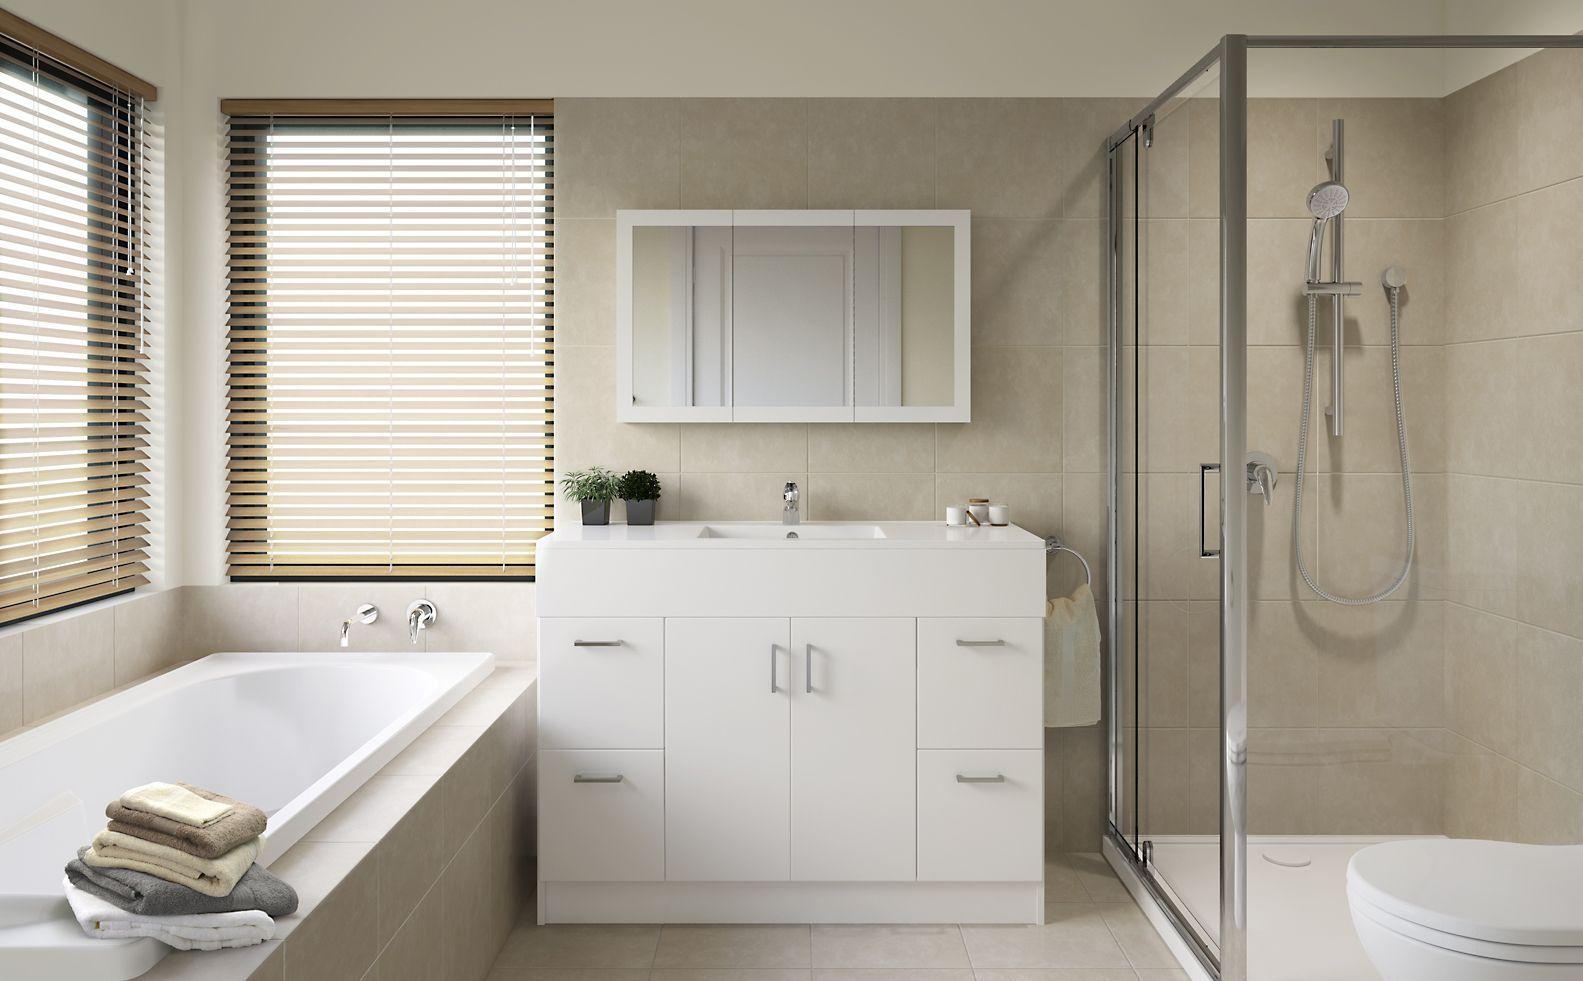 Latest Posts Under: Bathroom inspiration | bathroom design 2017-2018 ...